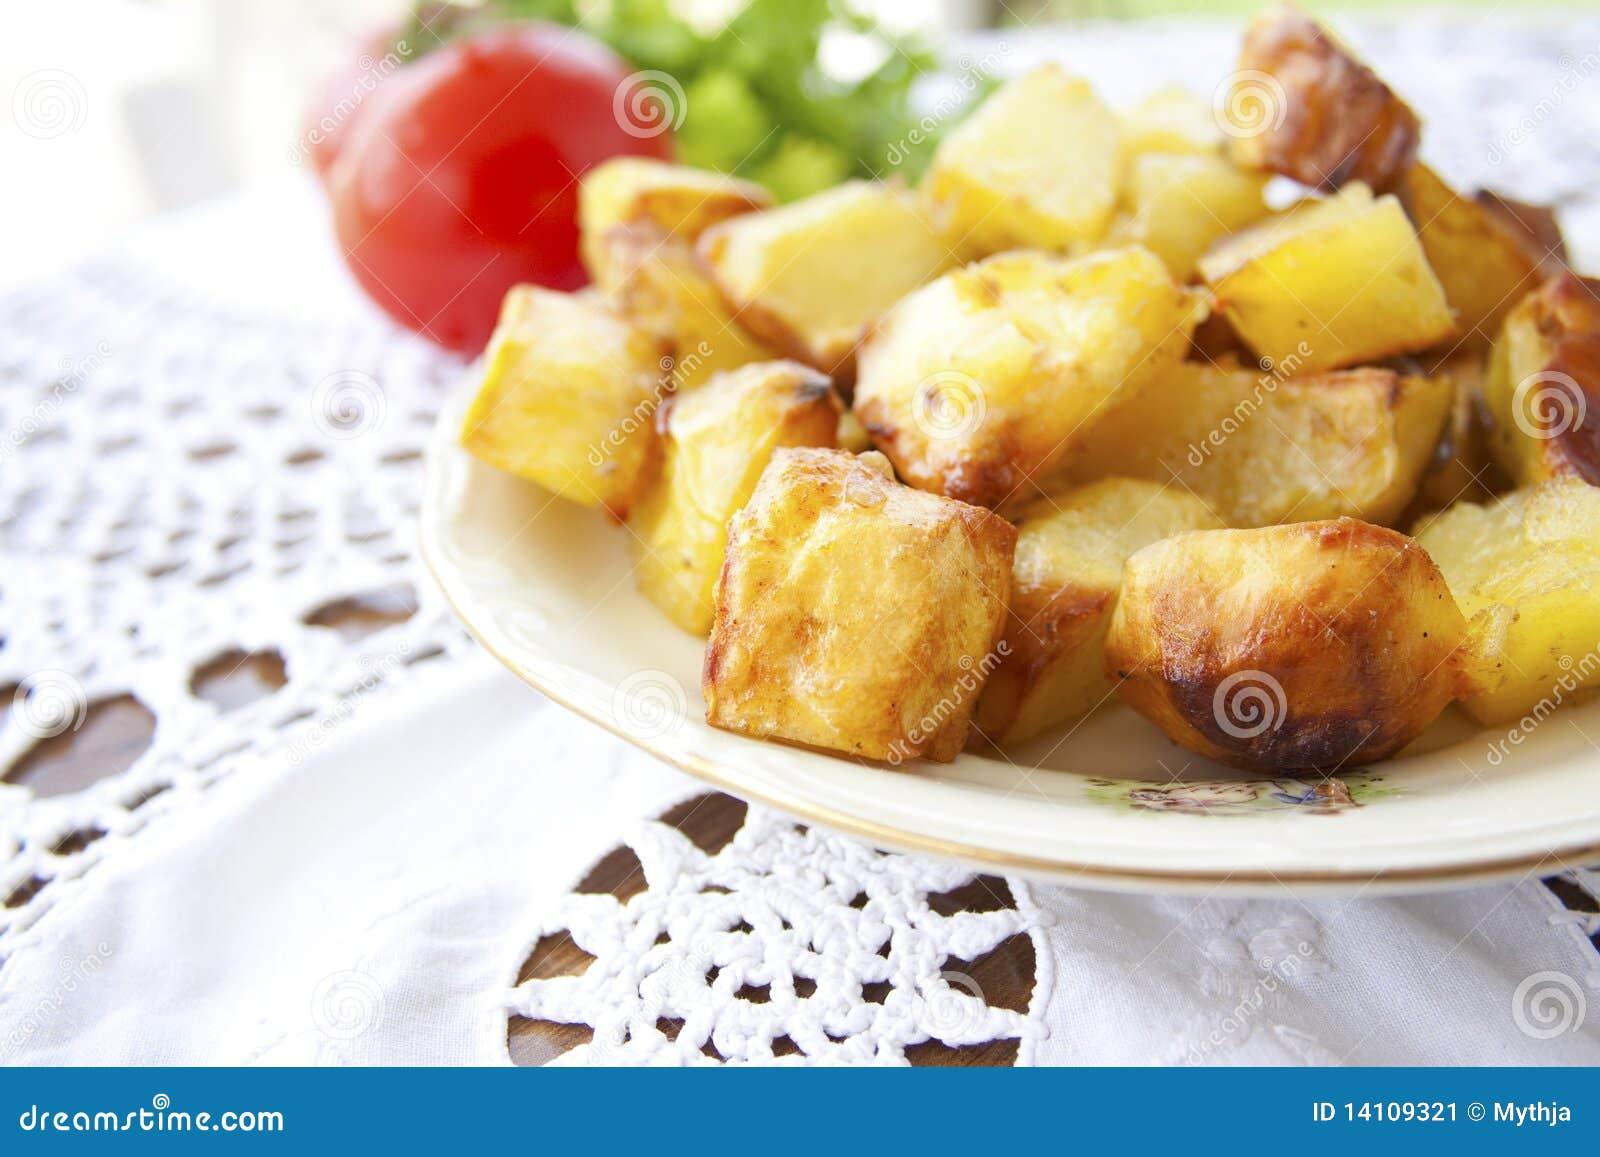 Roasted golden potatoes